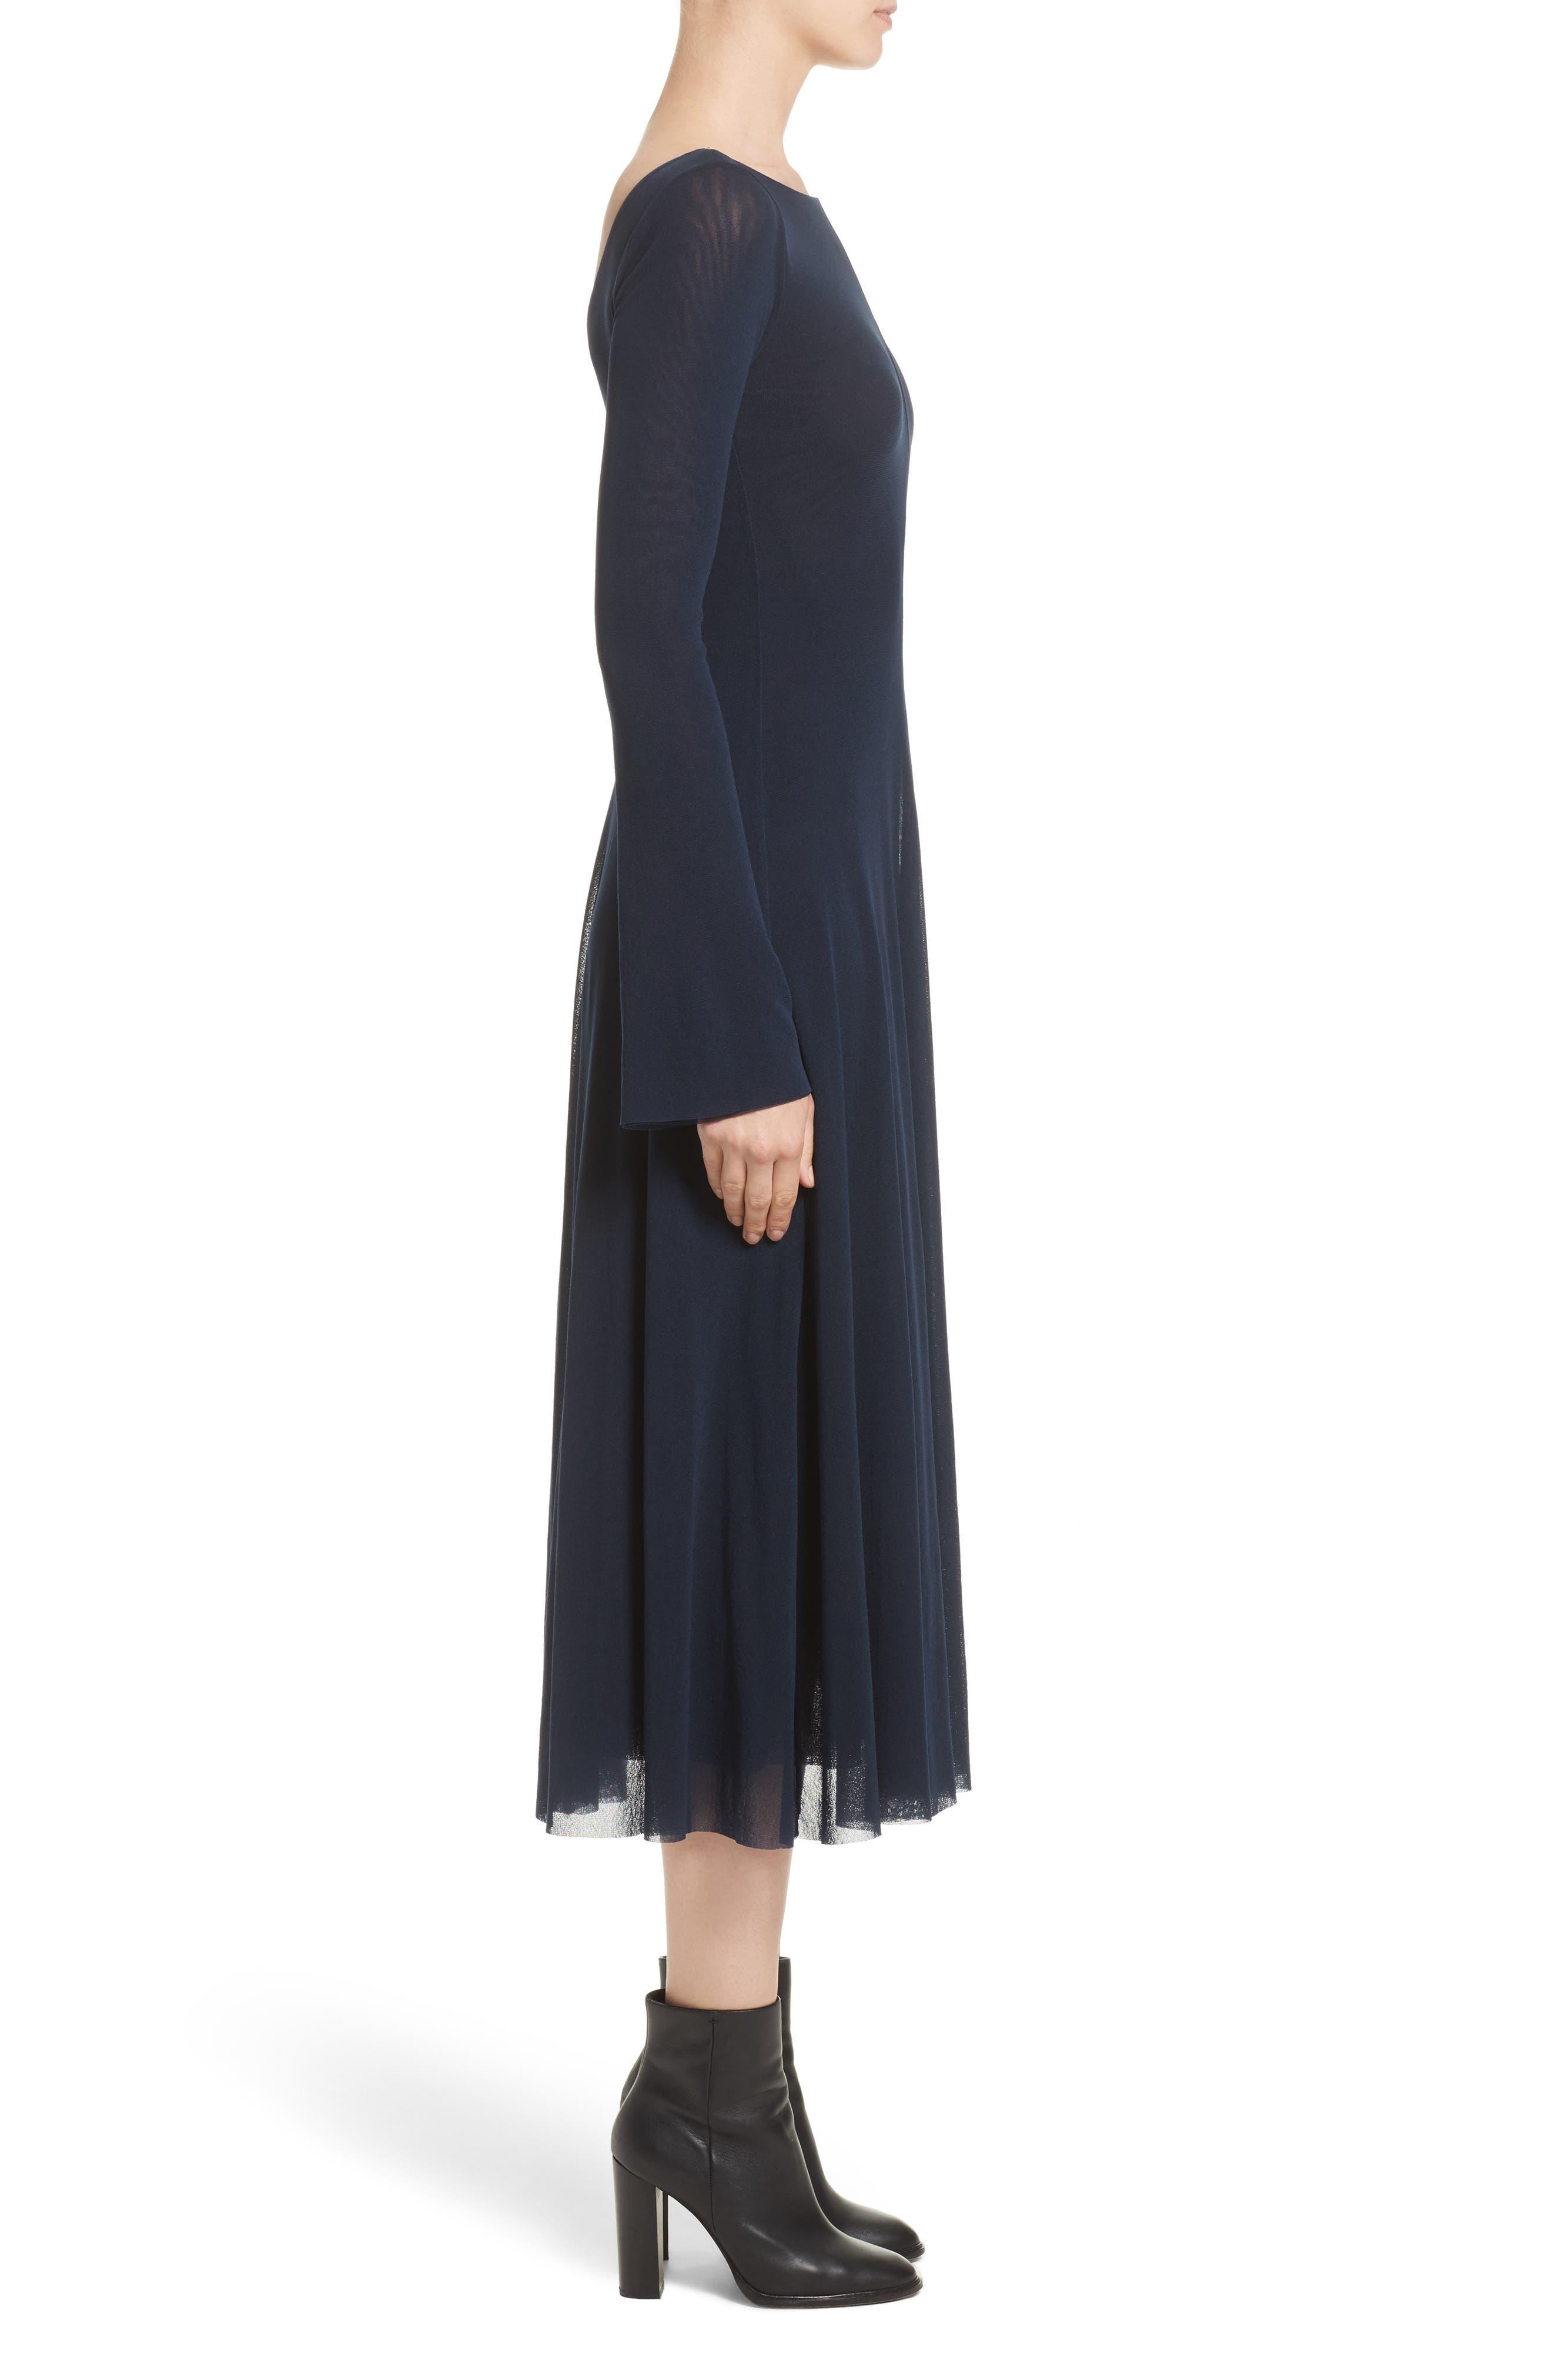 Reversible Tulle Dress,                             Alternate thumbnail 4, color,                             001